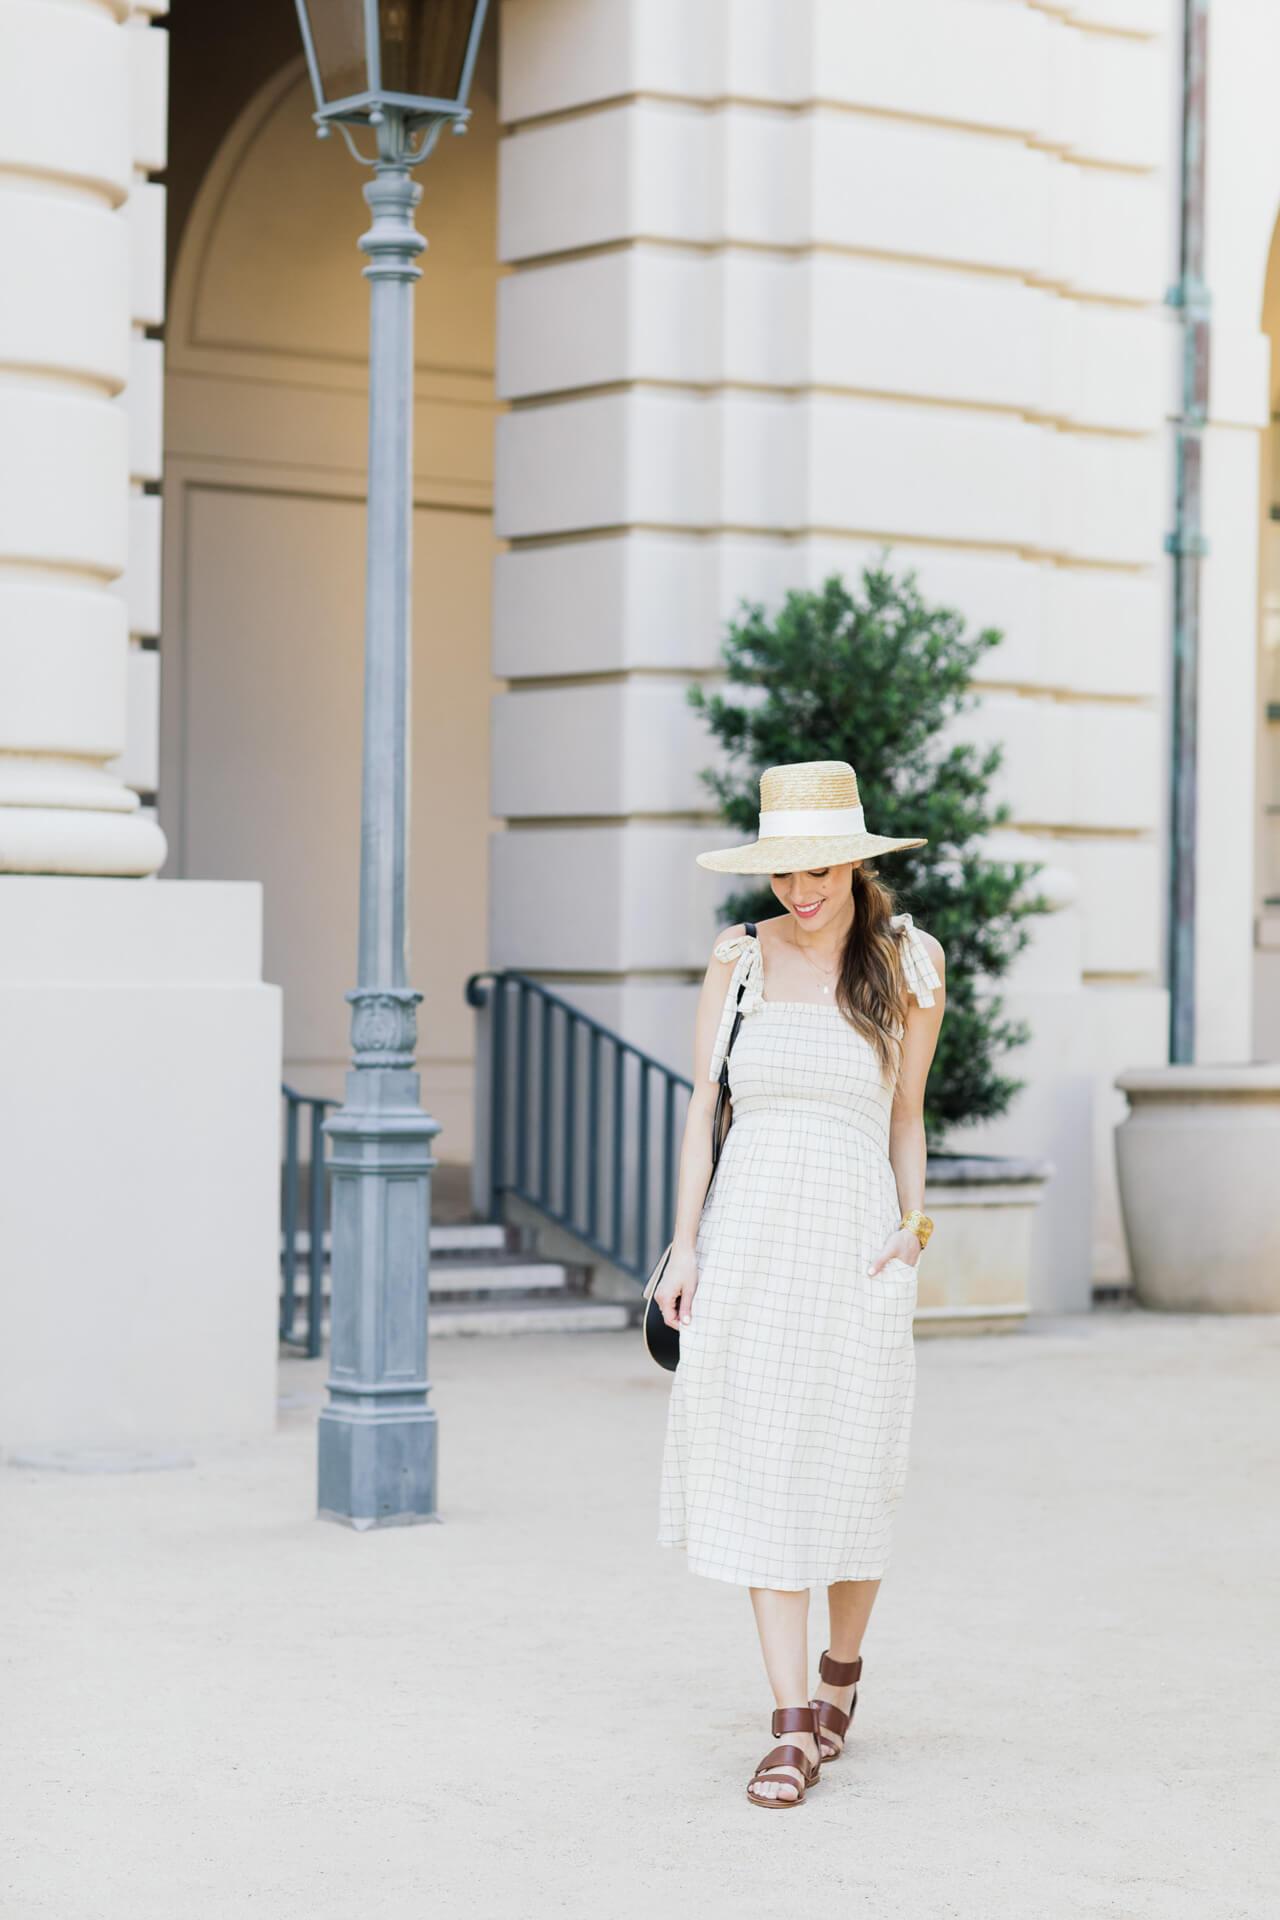 Stylish way to wear a summer midi dress